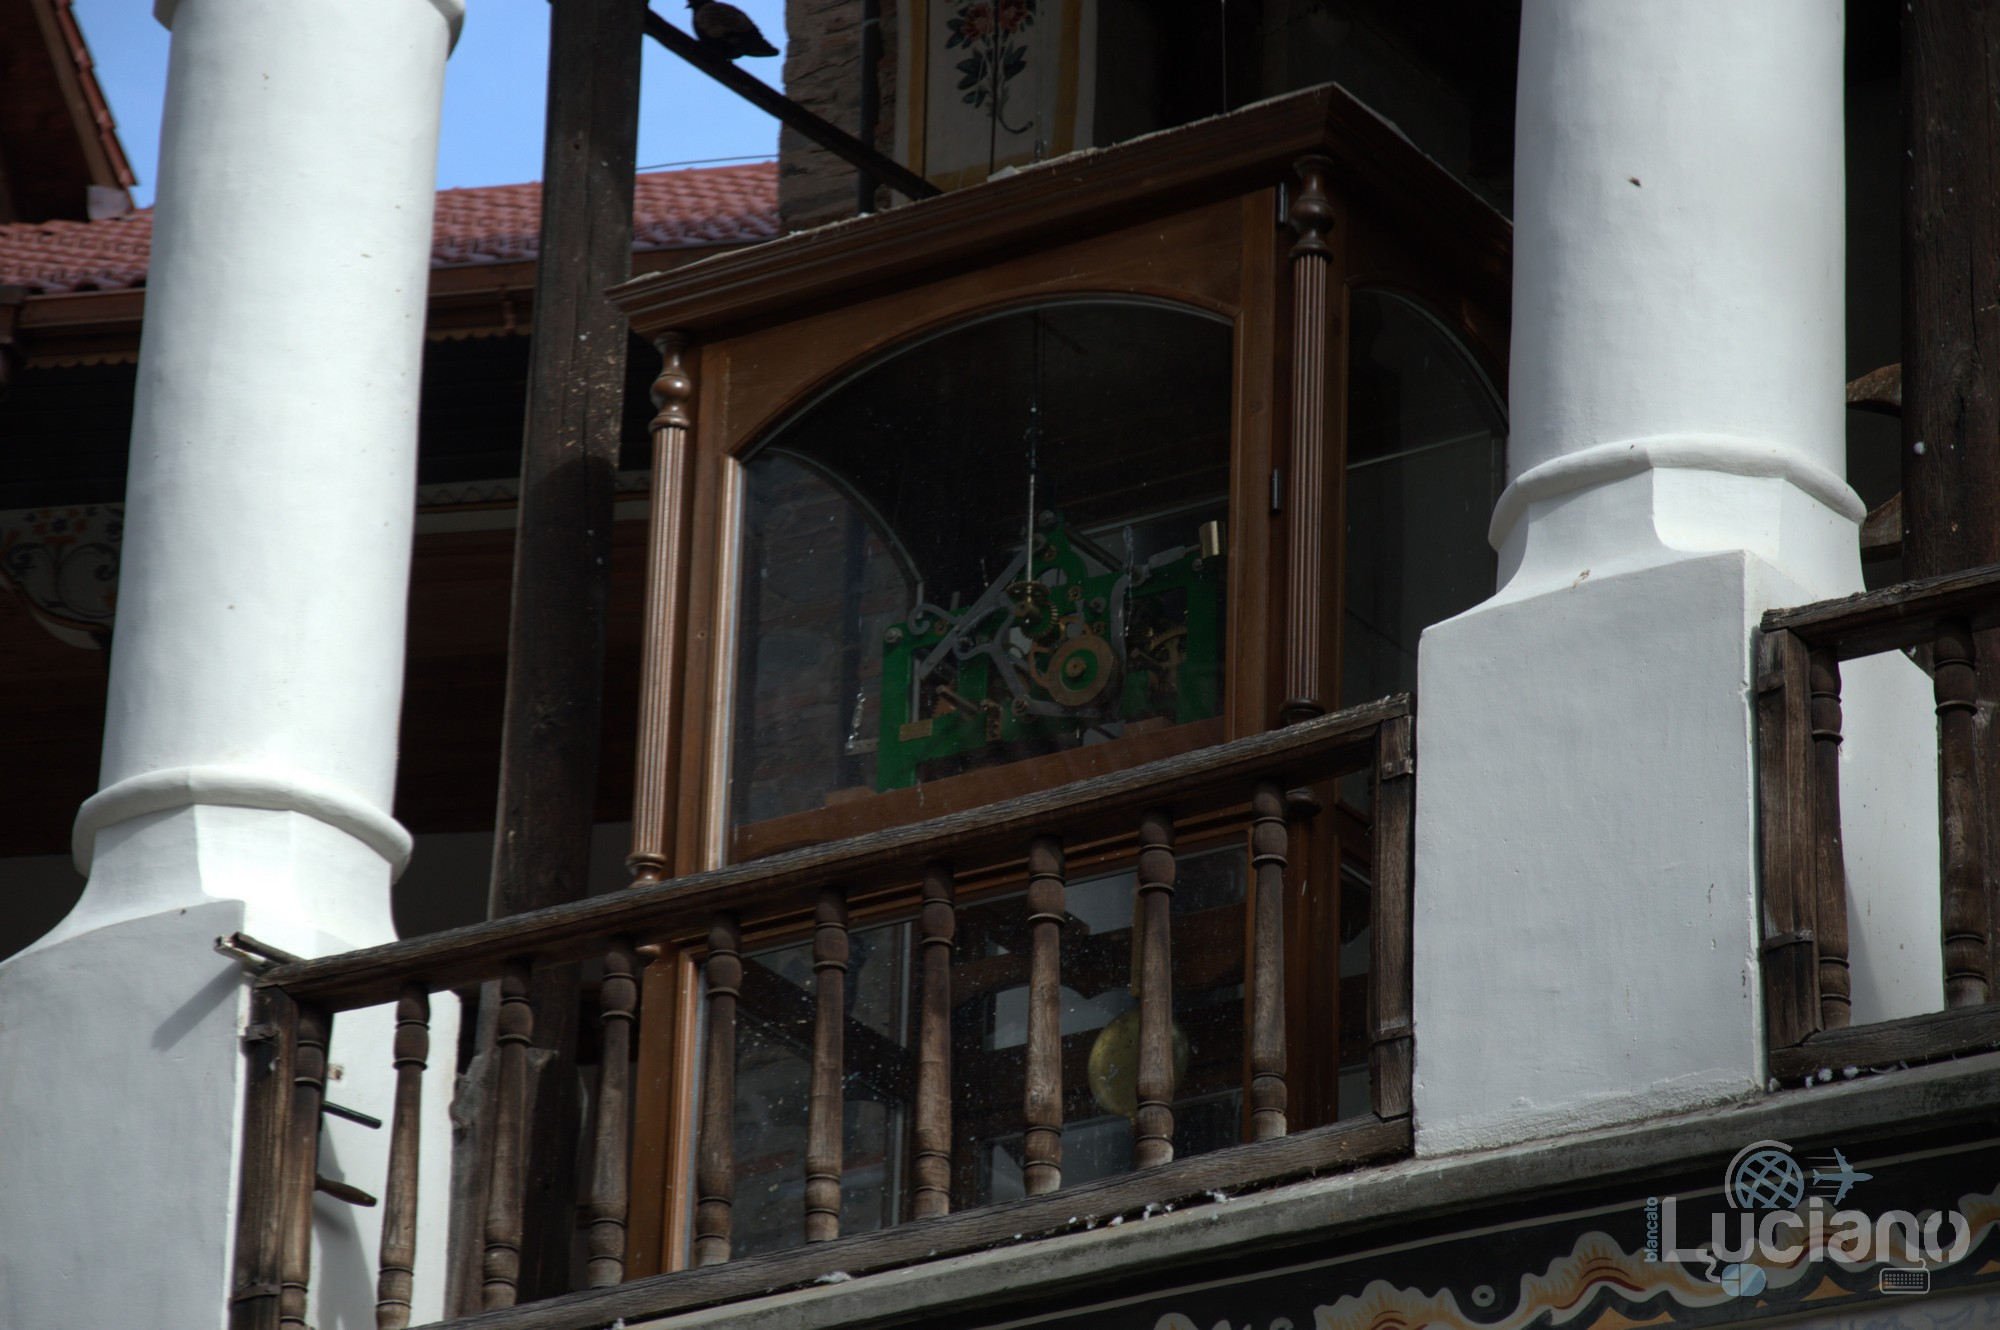 Vista interna - orologio campanile - Monastero di Rila, Рилски Манастир, Rilski Manastir - Sofia - Bulgaria